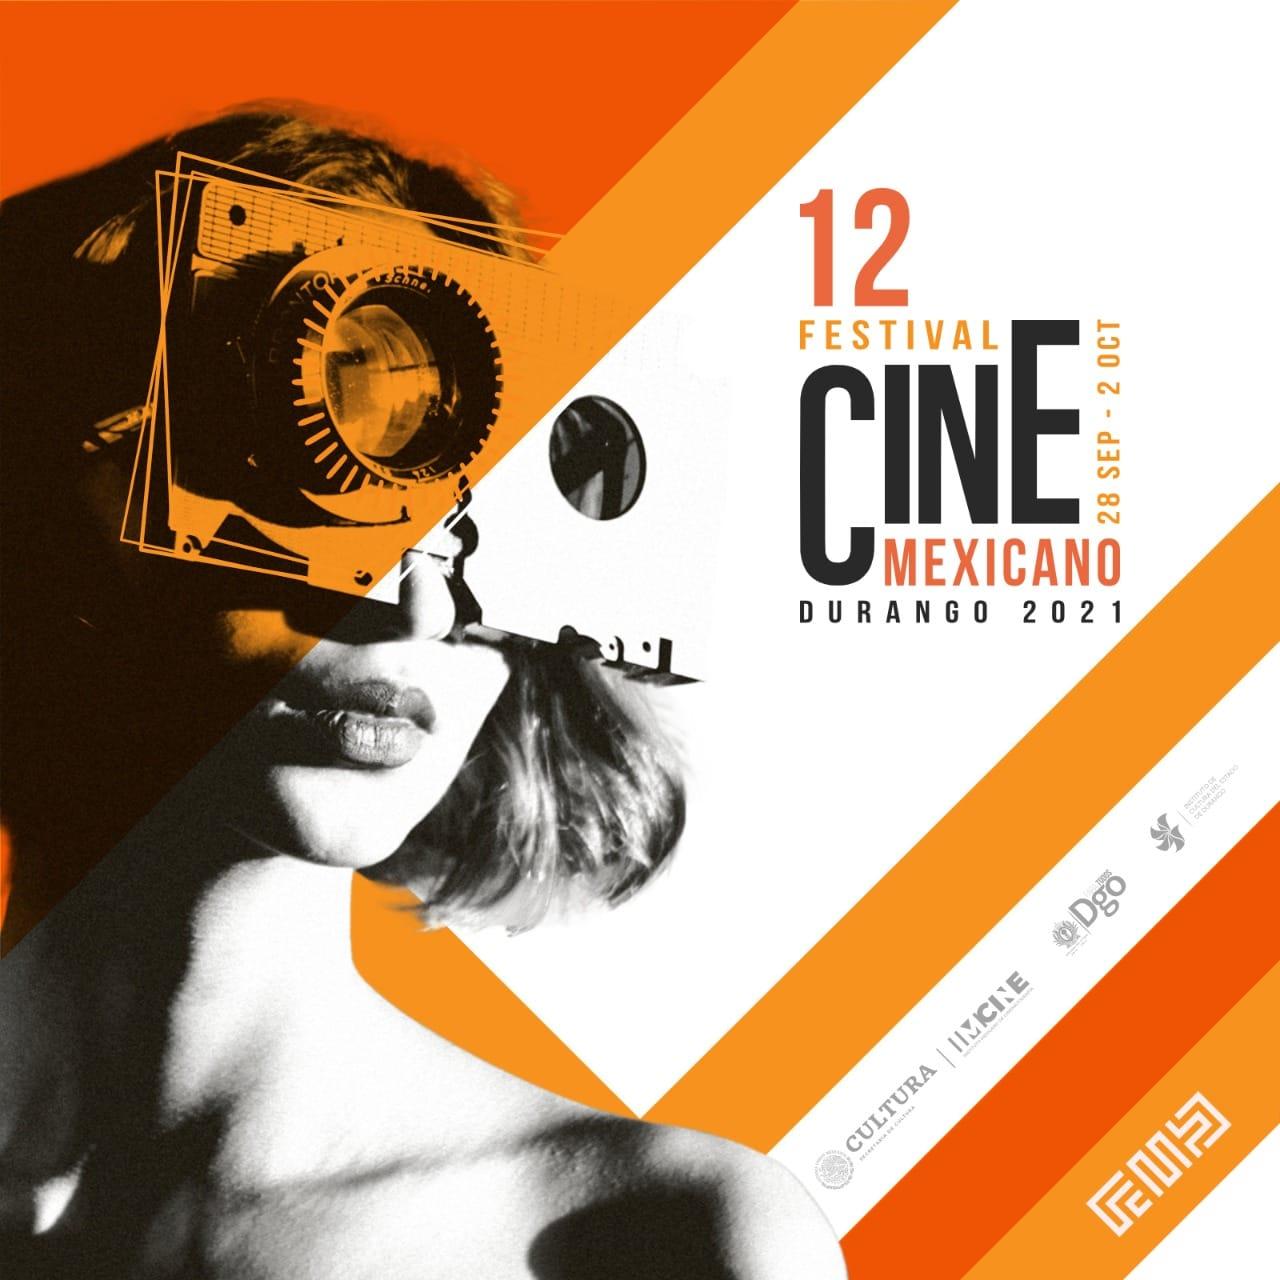 12 Festival de Cine Mexicano